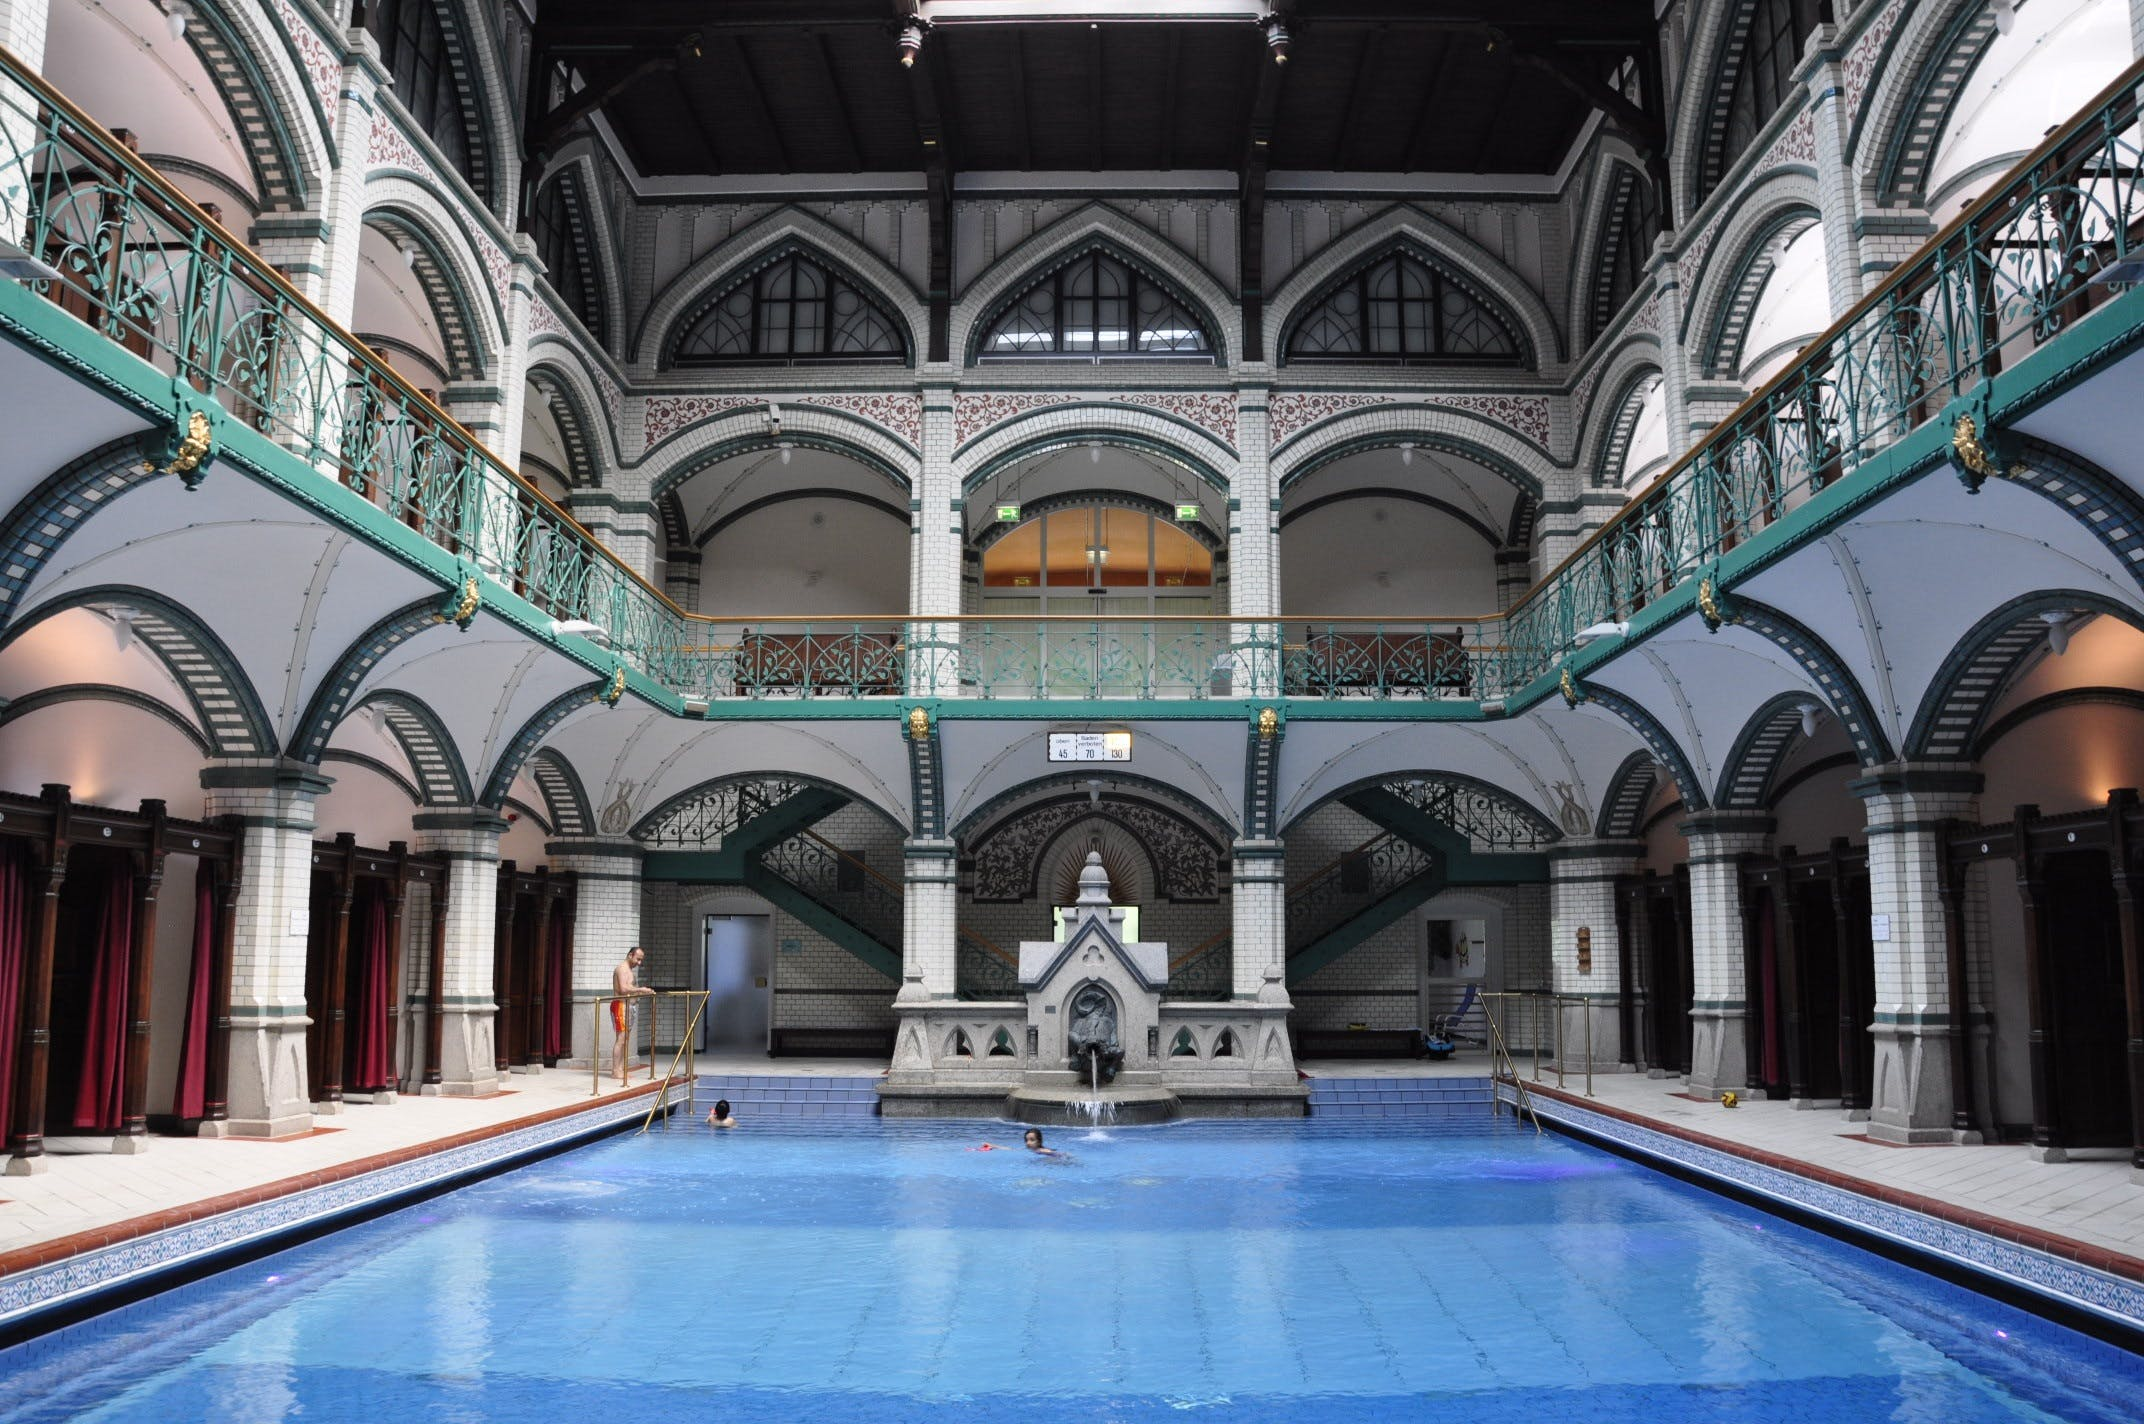 Free stock photo of architectural style, architecture, art nouveau, azur